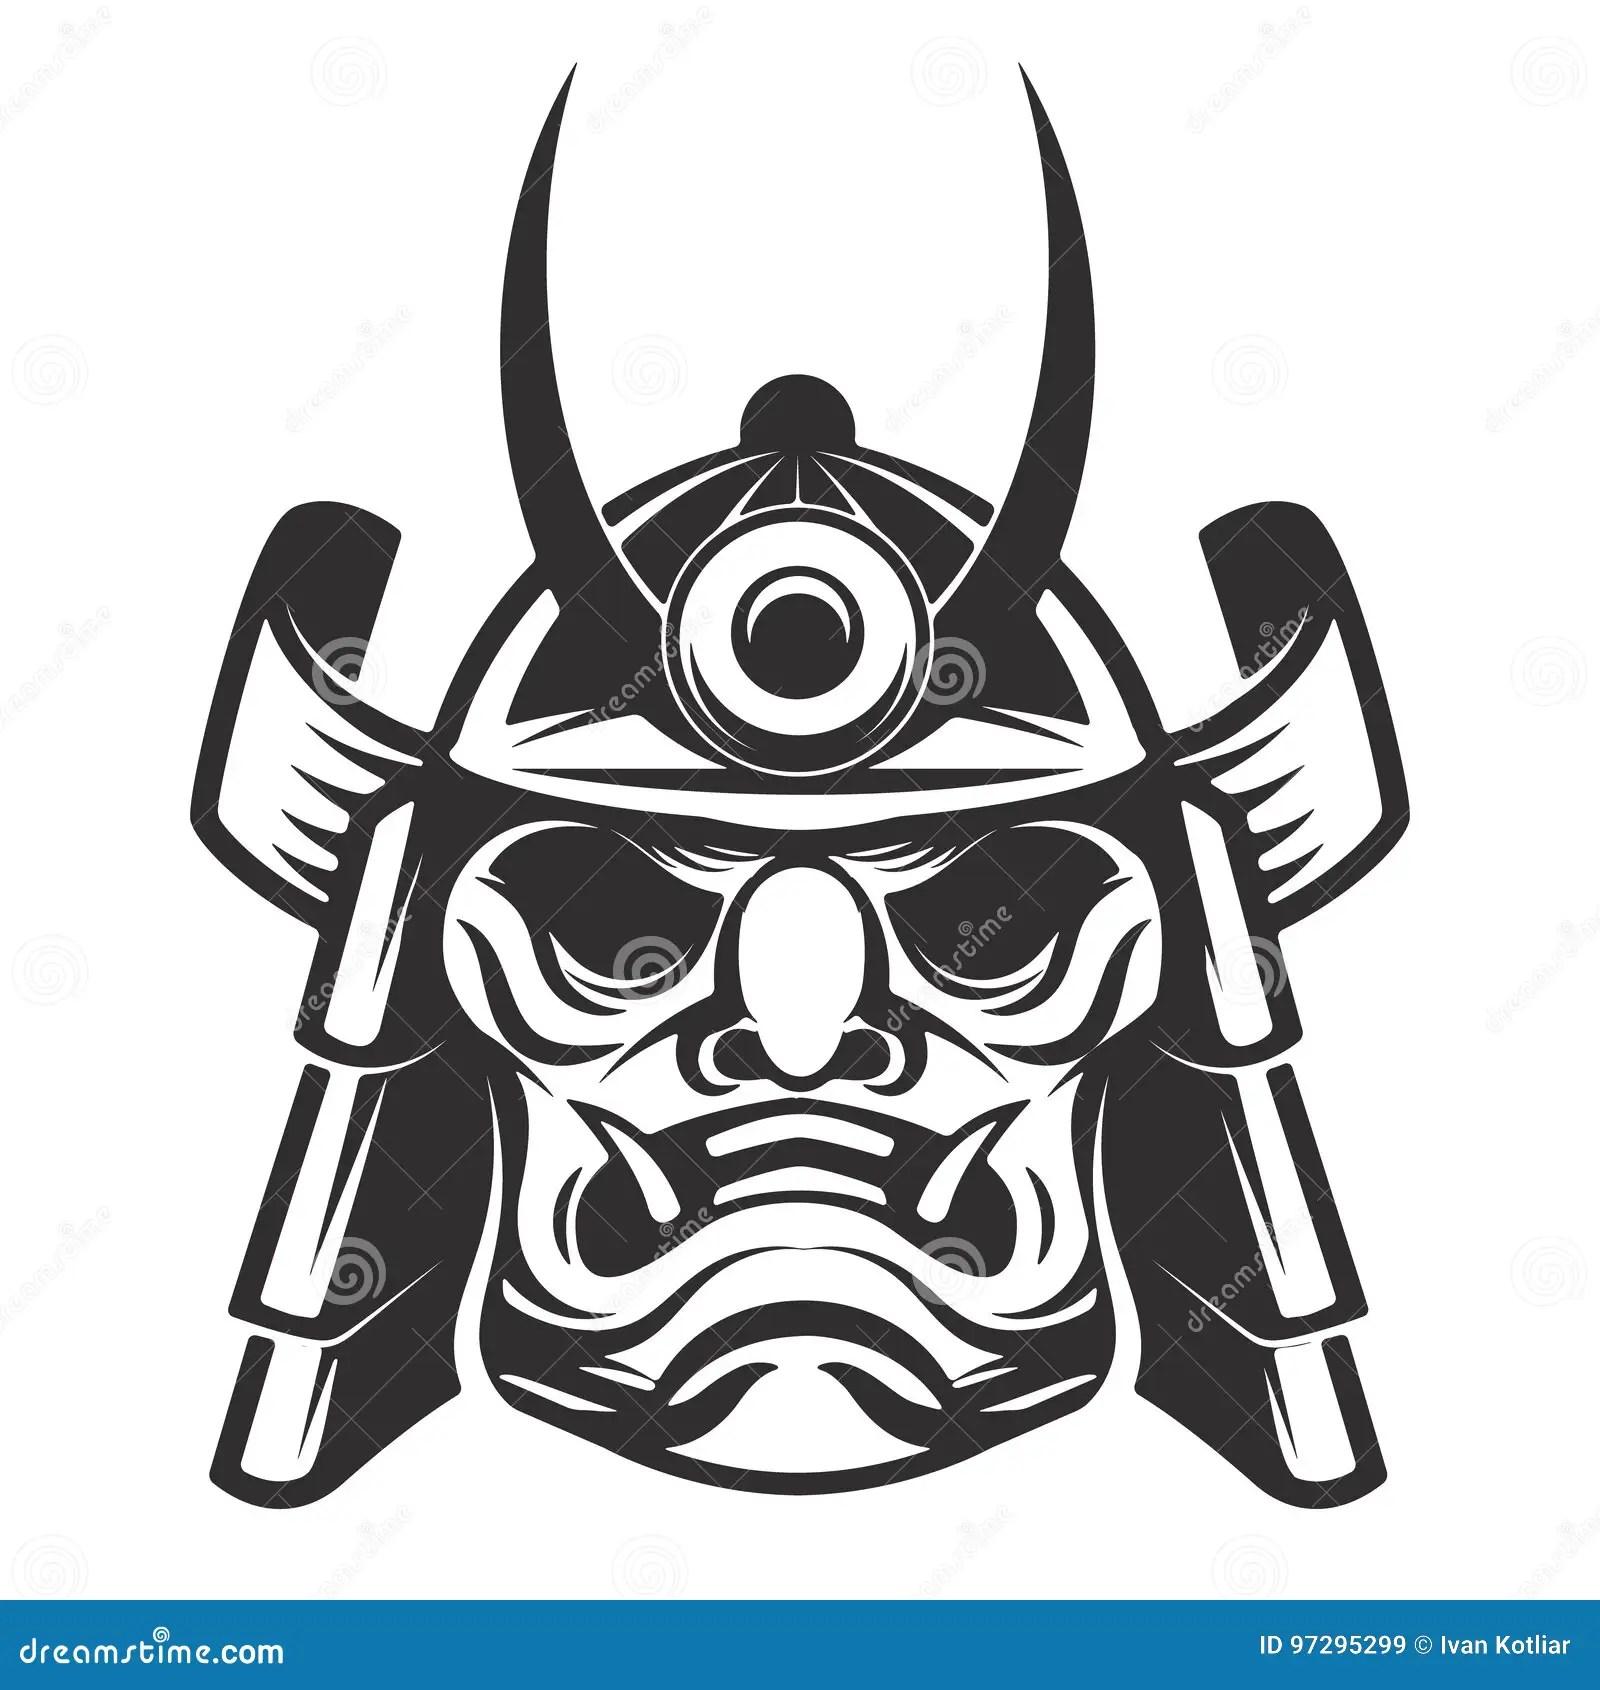 Japanese Samurai Warrior Helmet Isolated Stock